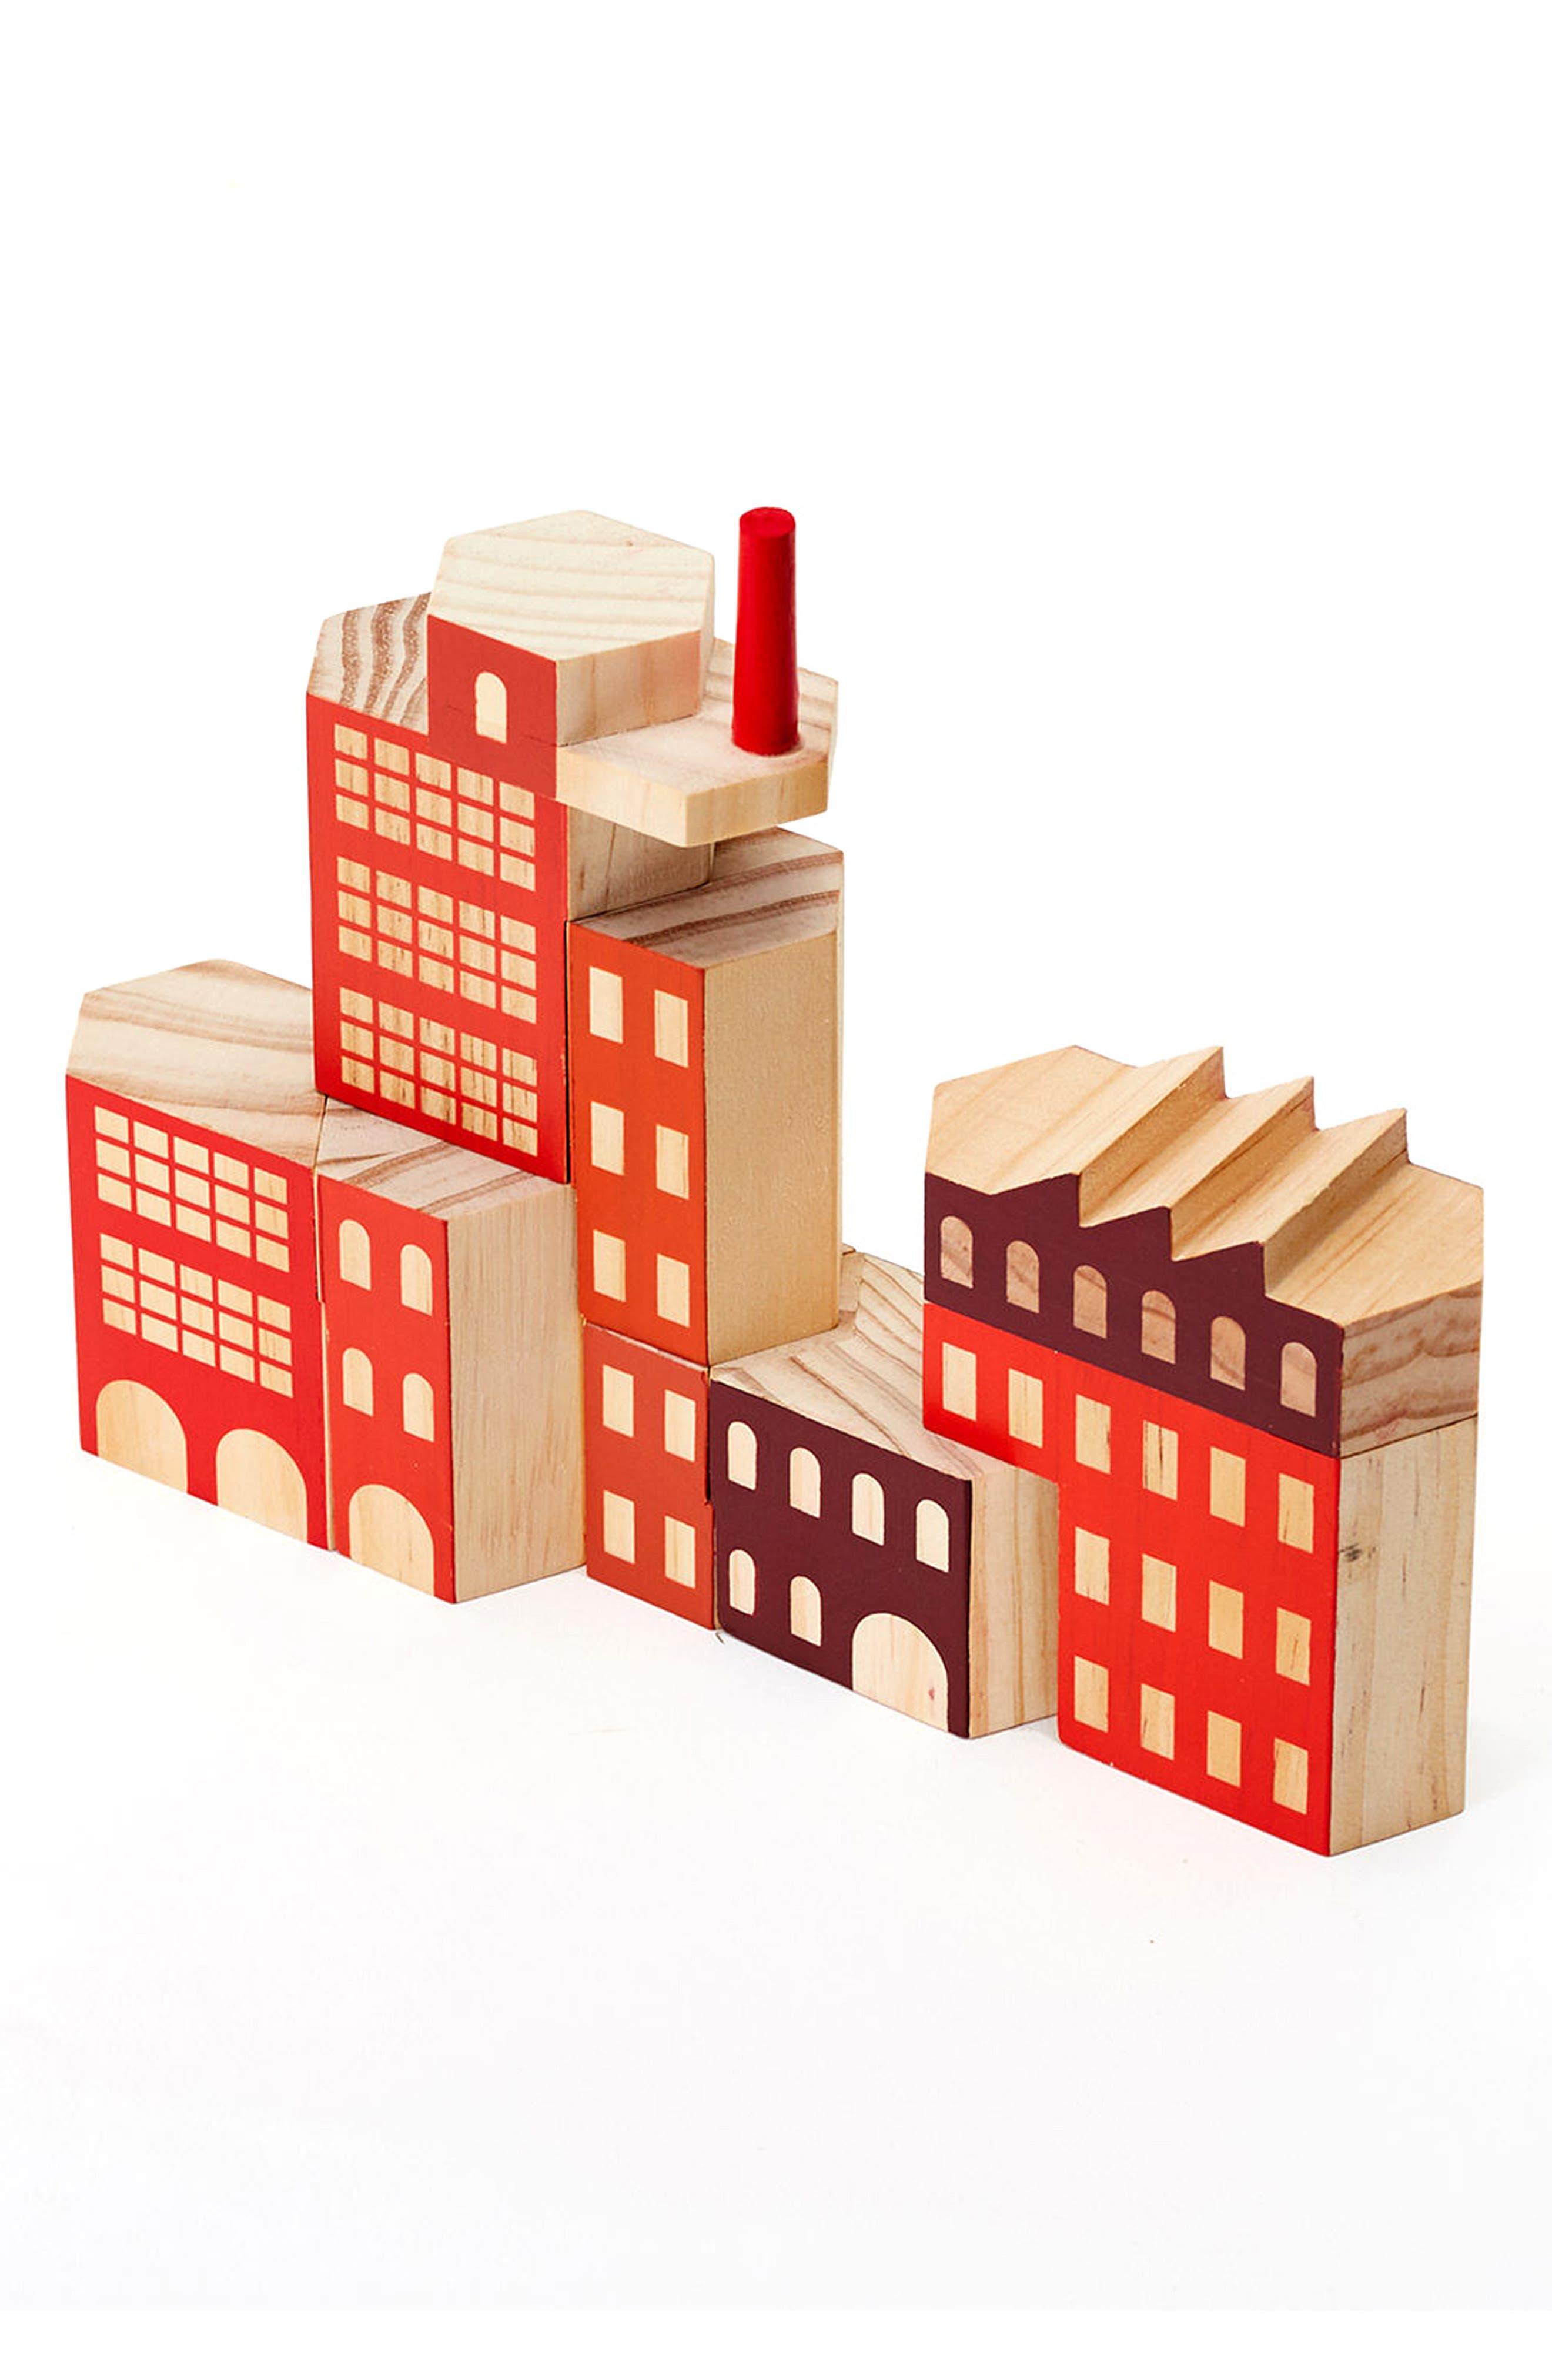 Areaware Blockitecture Factory 10-Piece Wooden Block Set